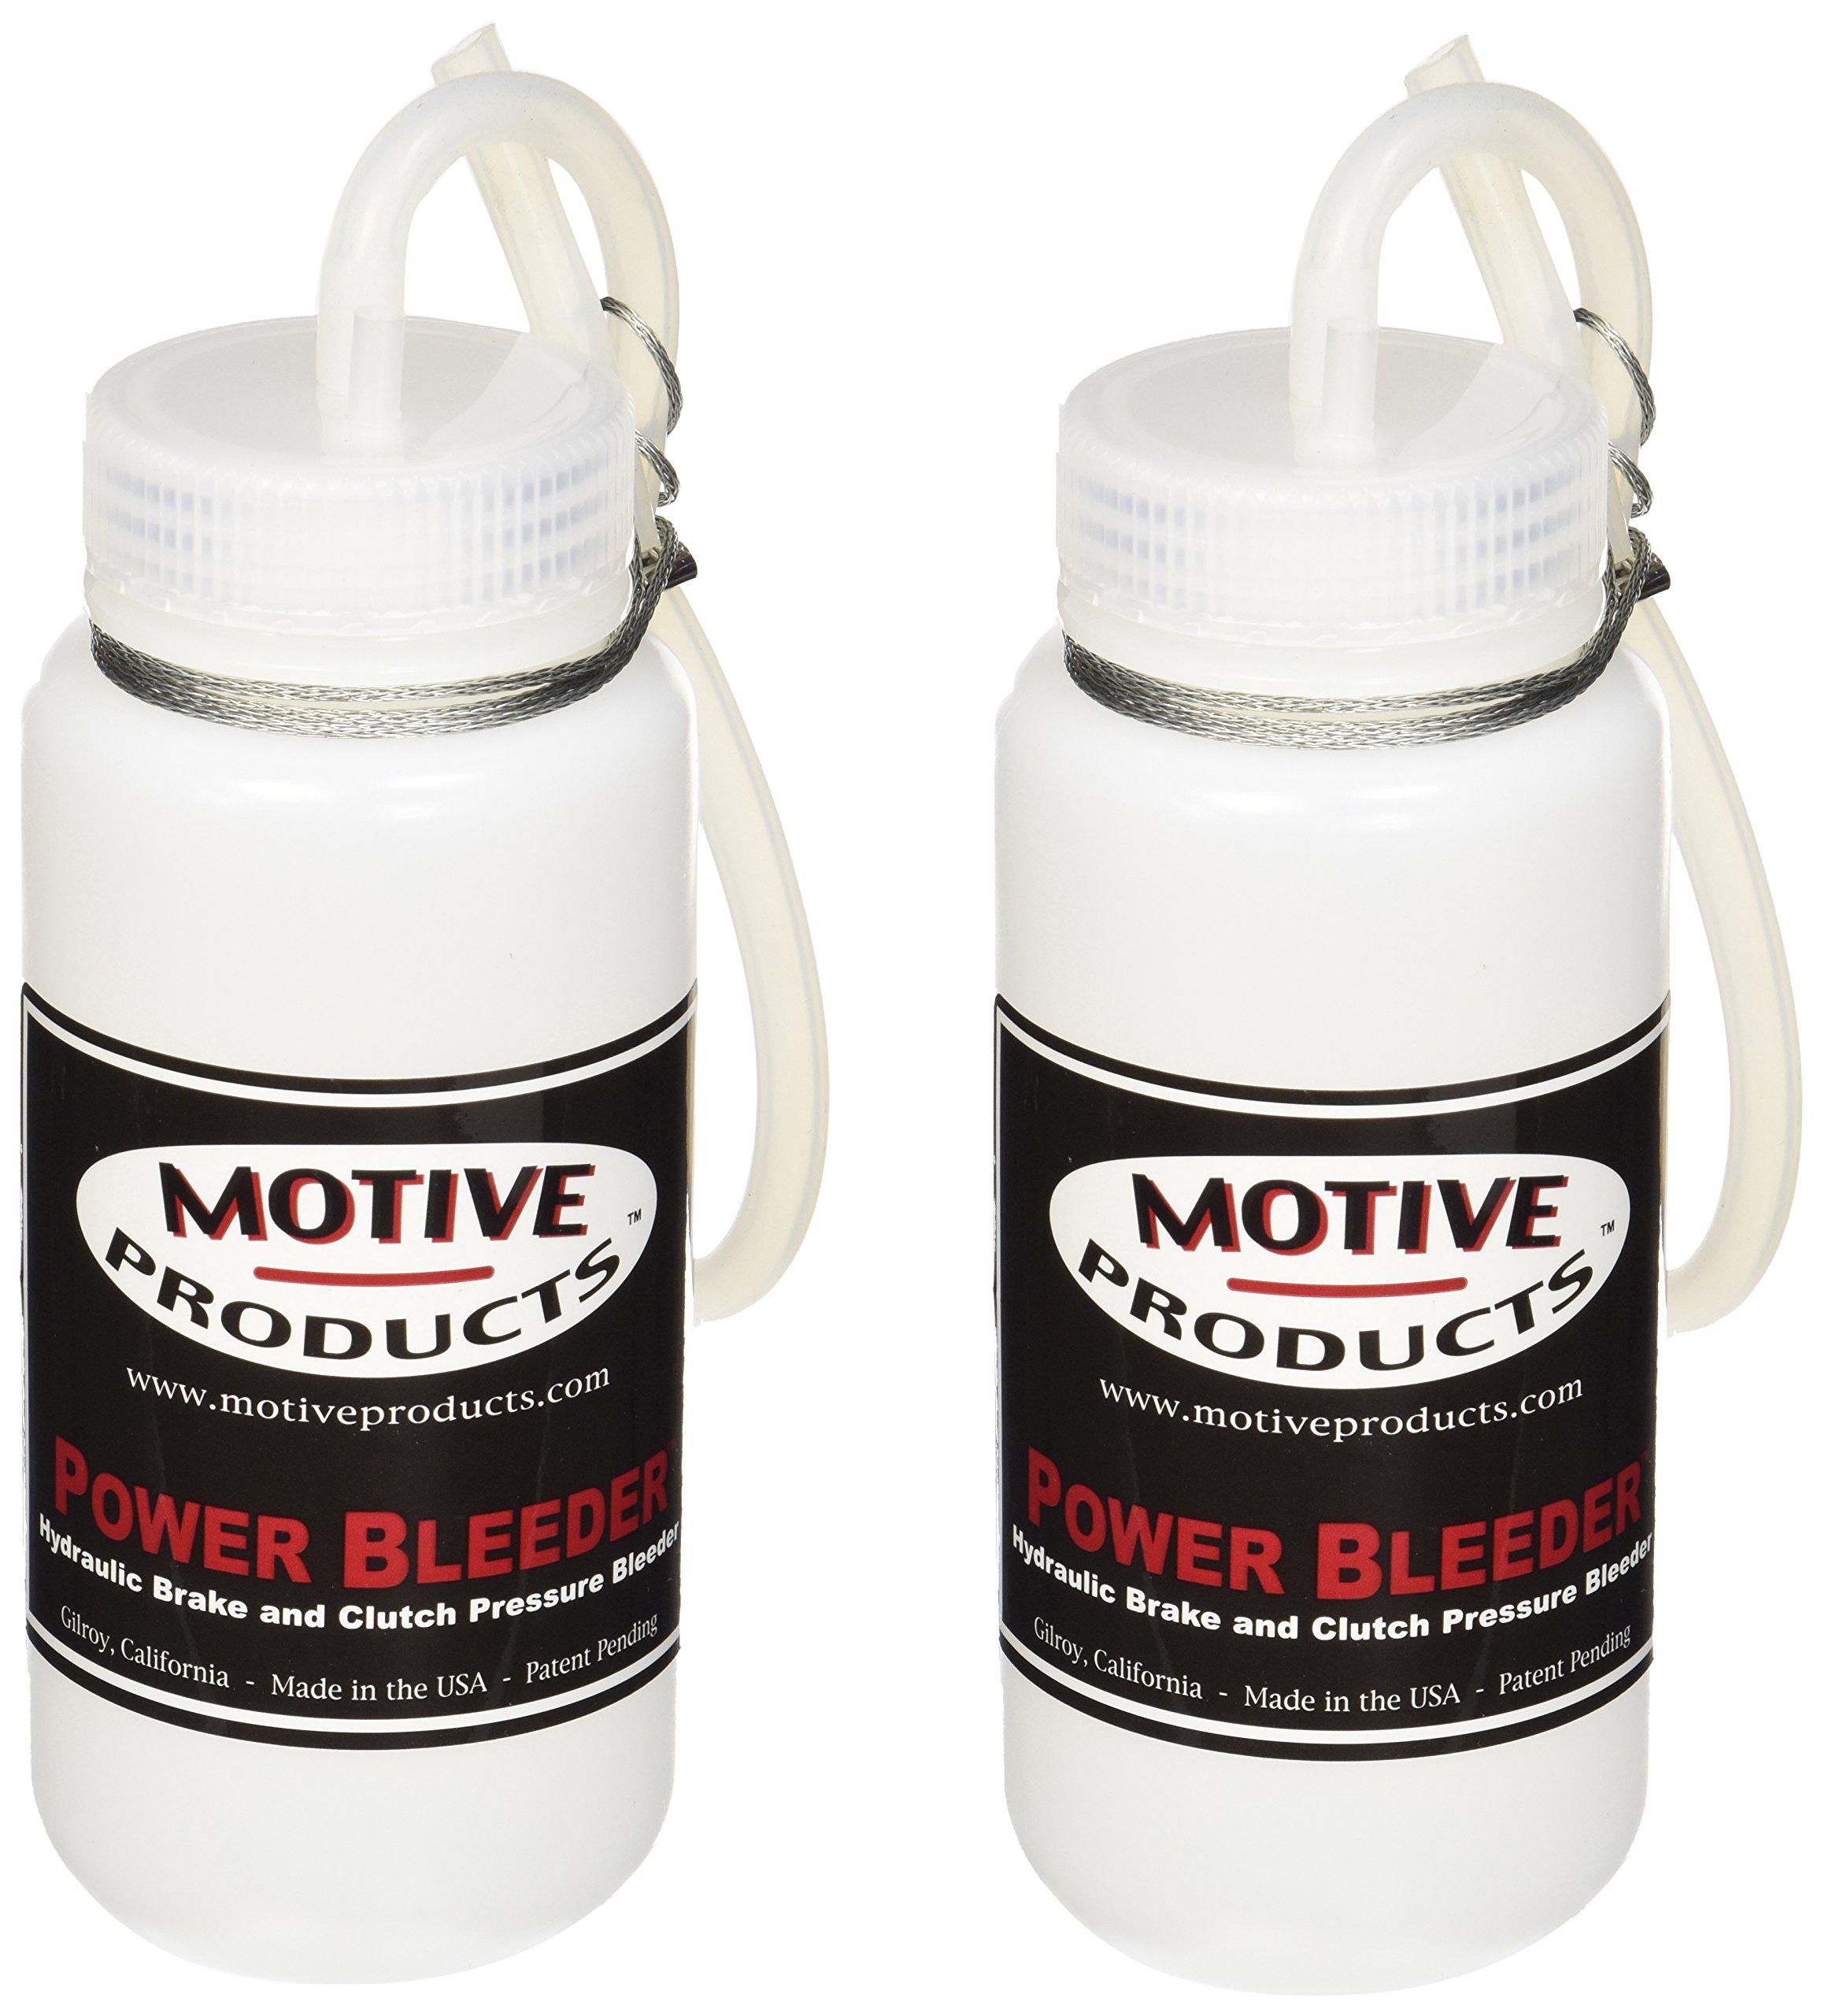 Motive Products 1820 Brake Fluid Catch Bottle Kit by Motive Products